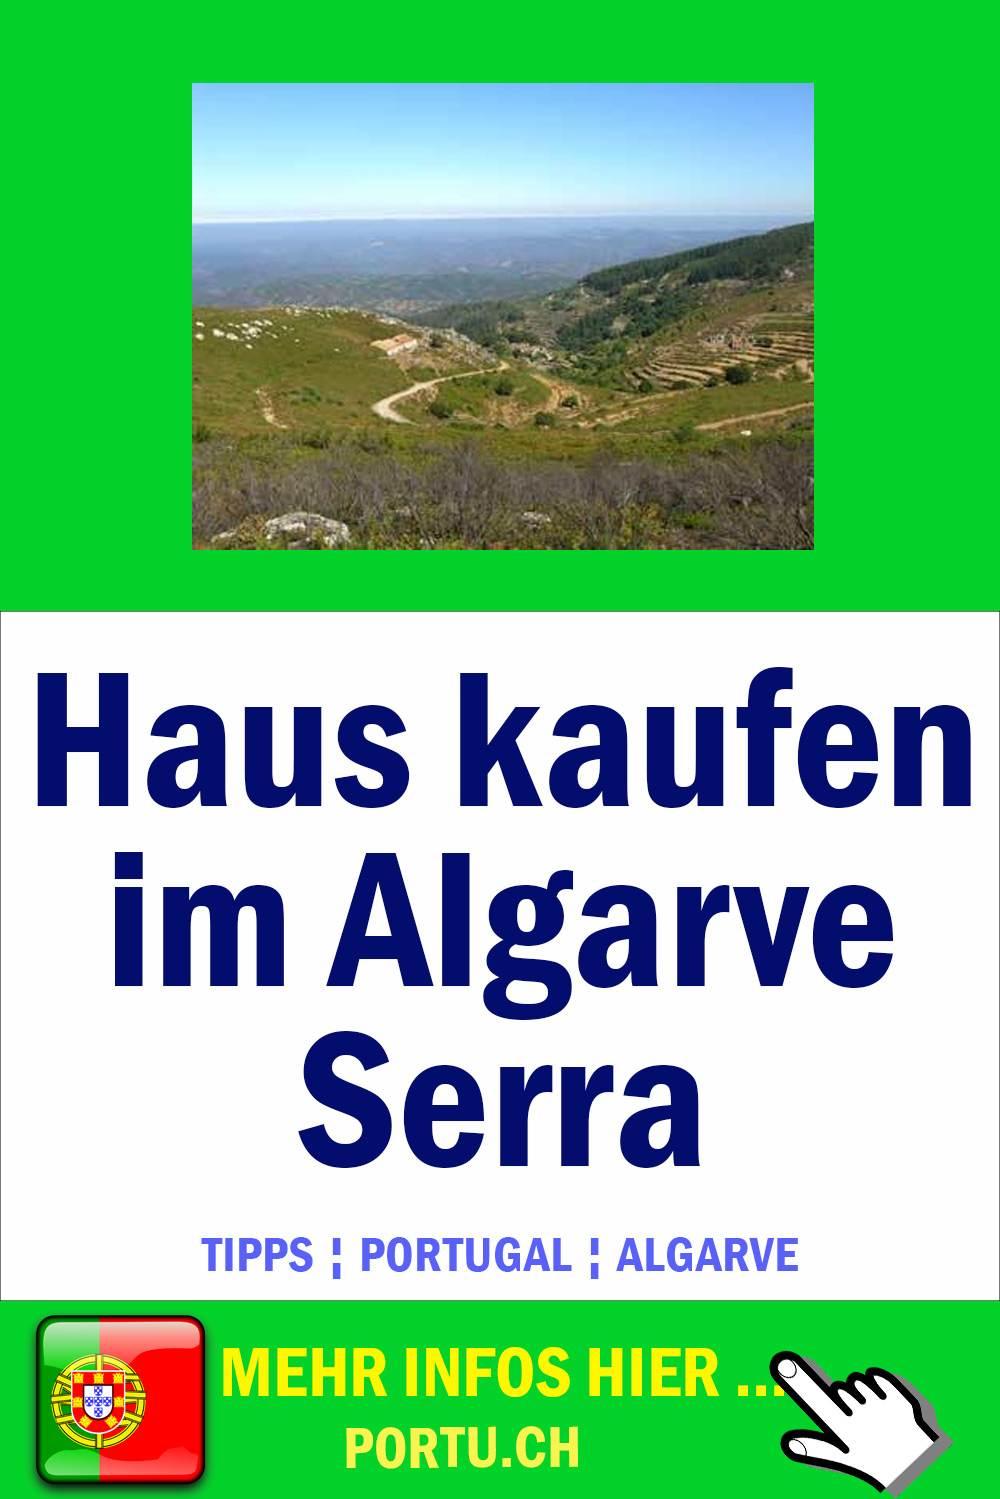 Haus-Kaufen-Algarve-Serra